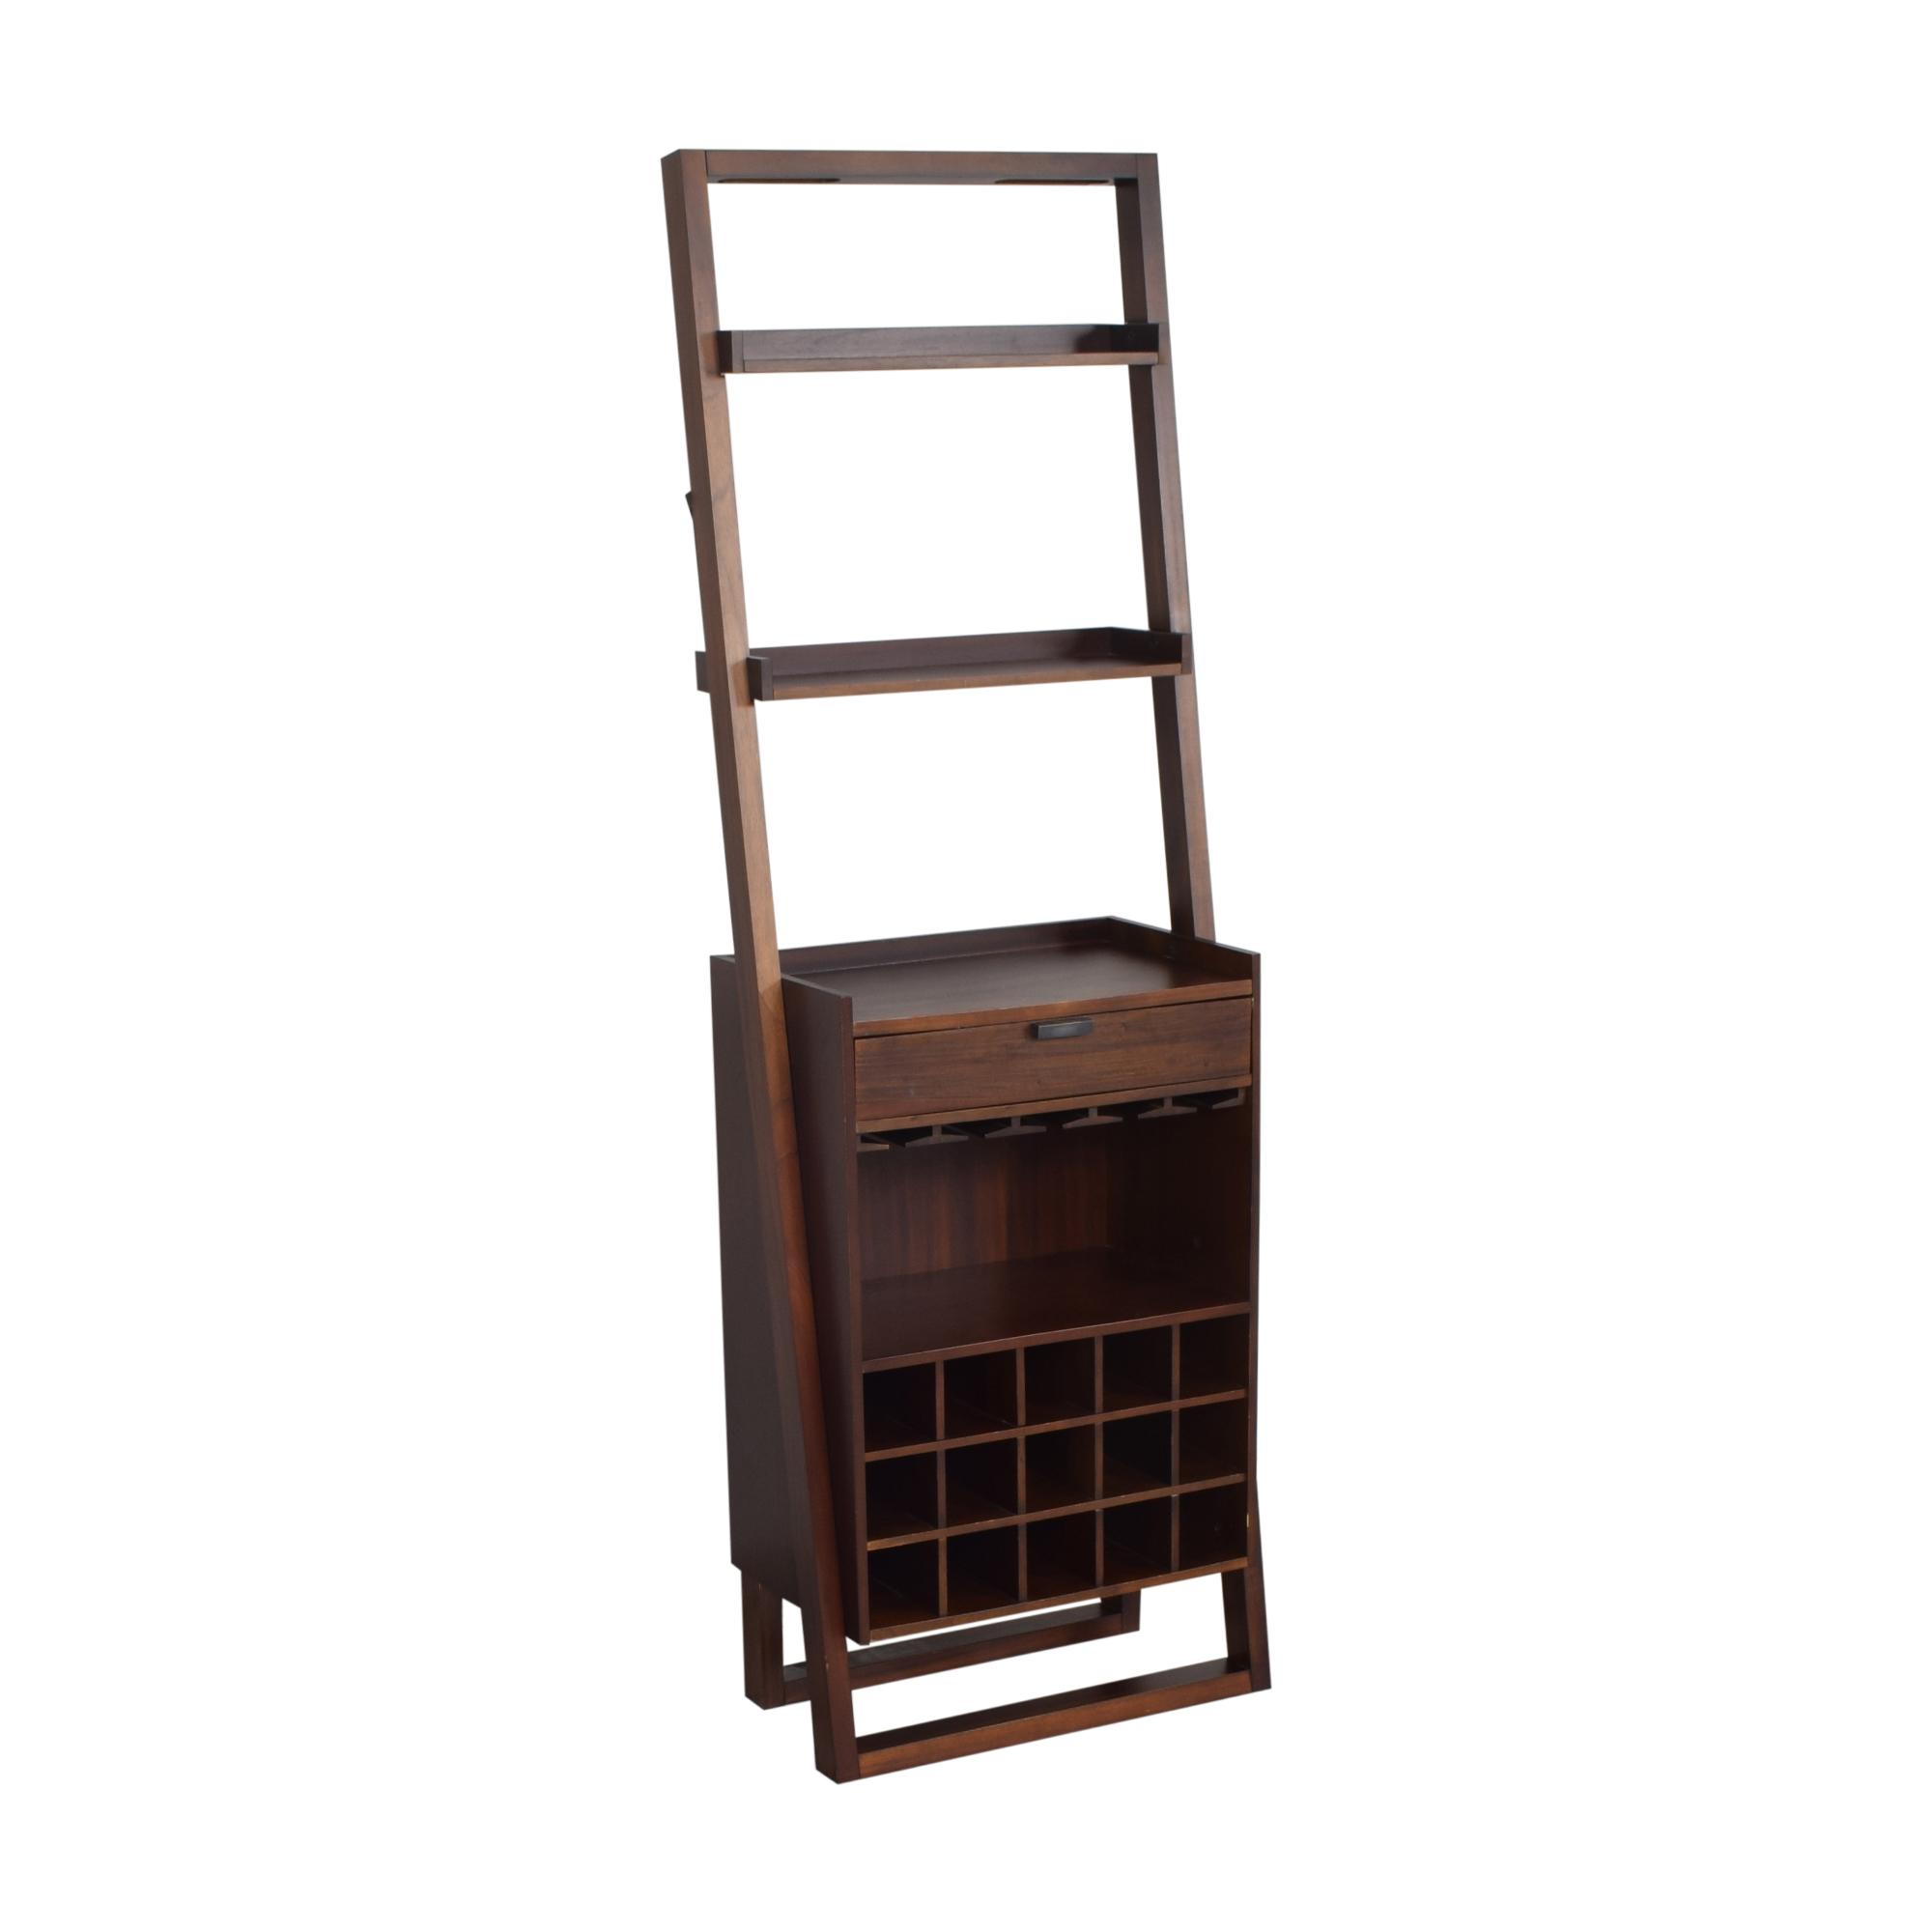 Crate & Barrel Crate & Barrel Sloane Leaning Wine Bar Storage